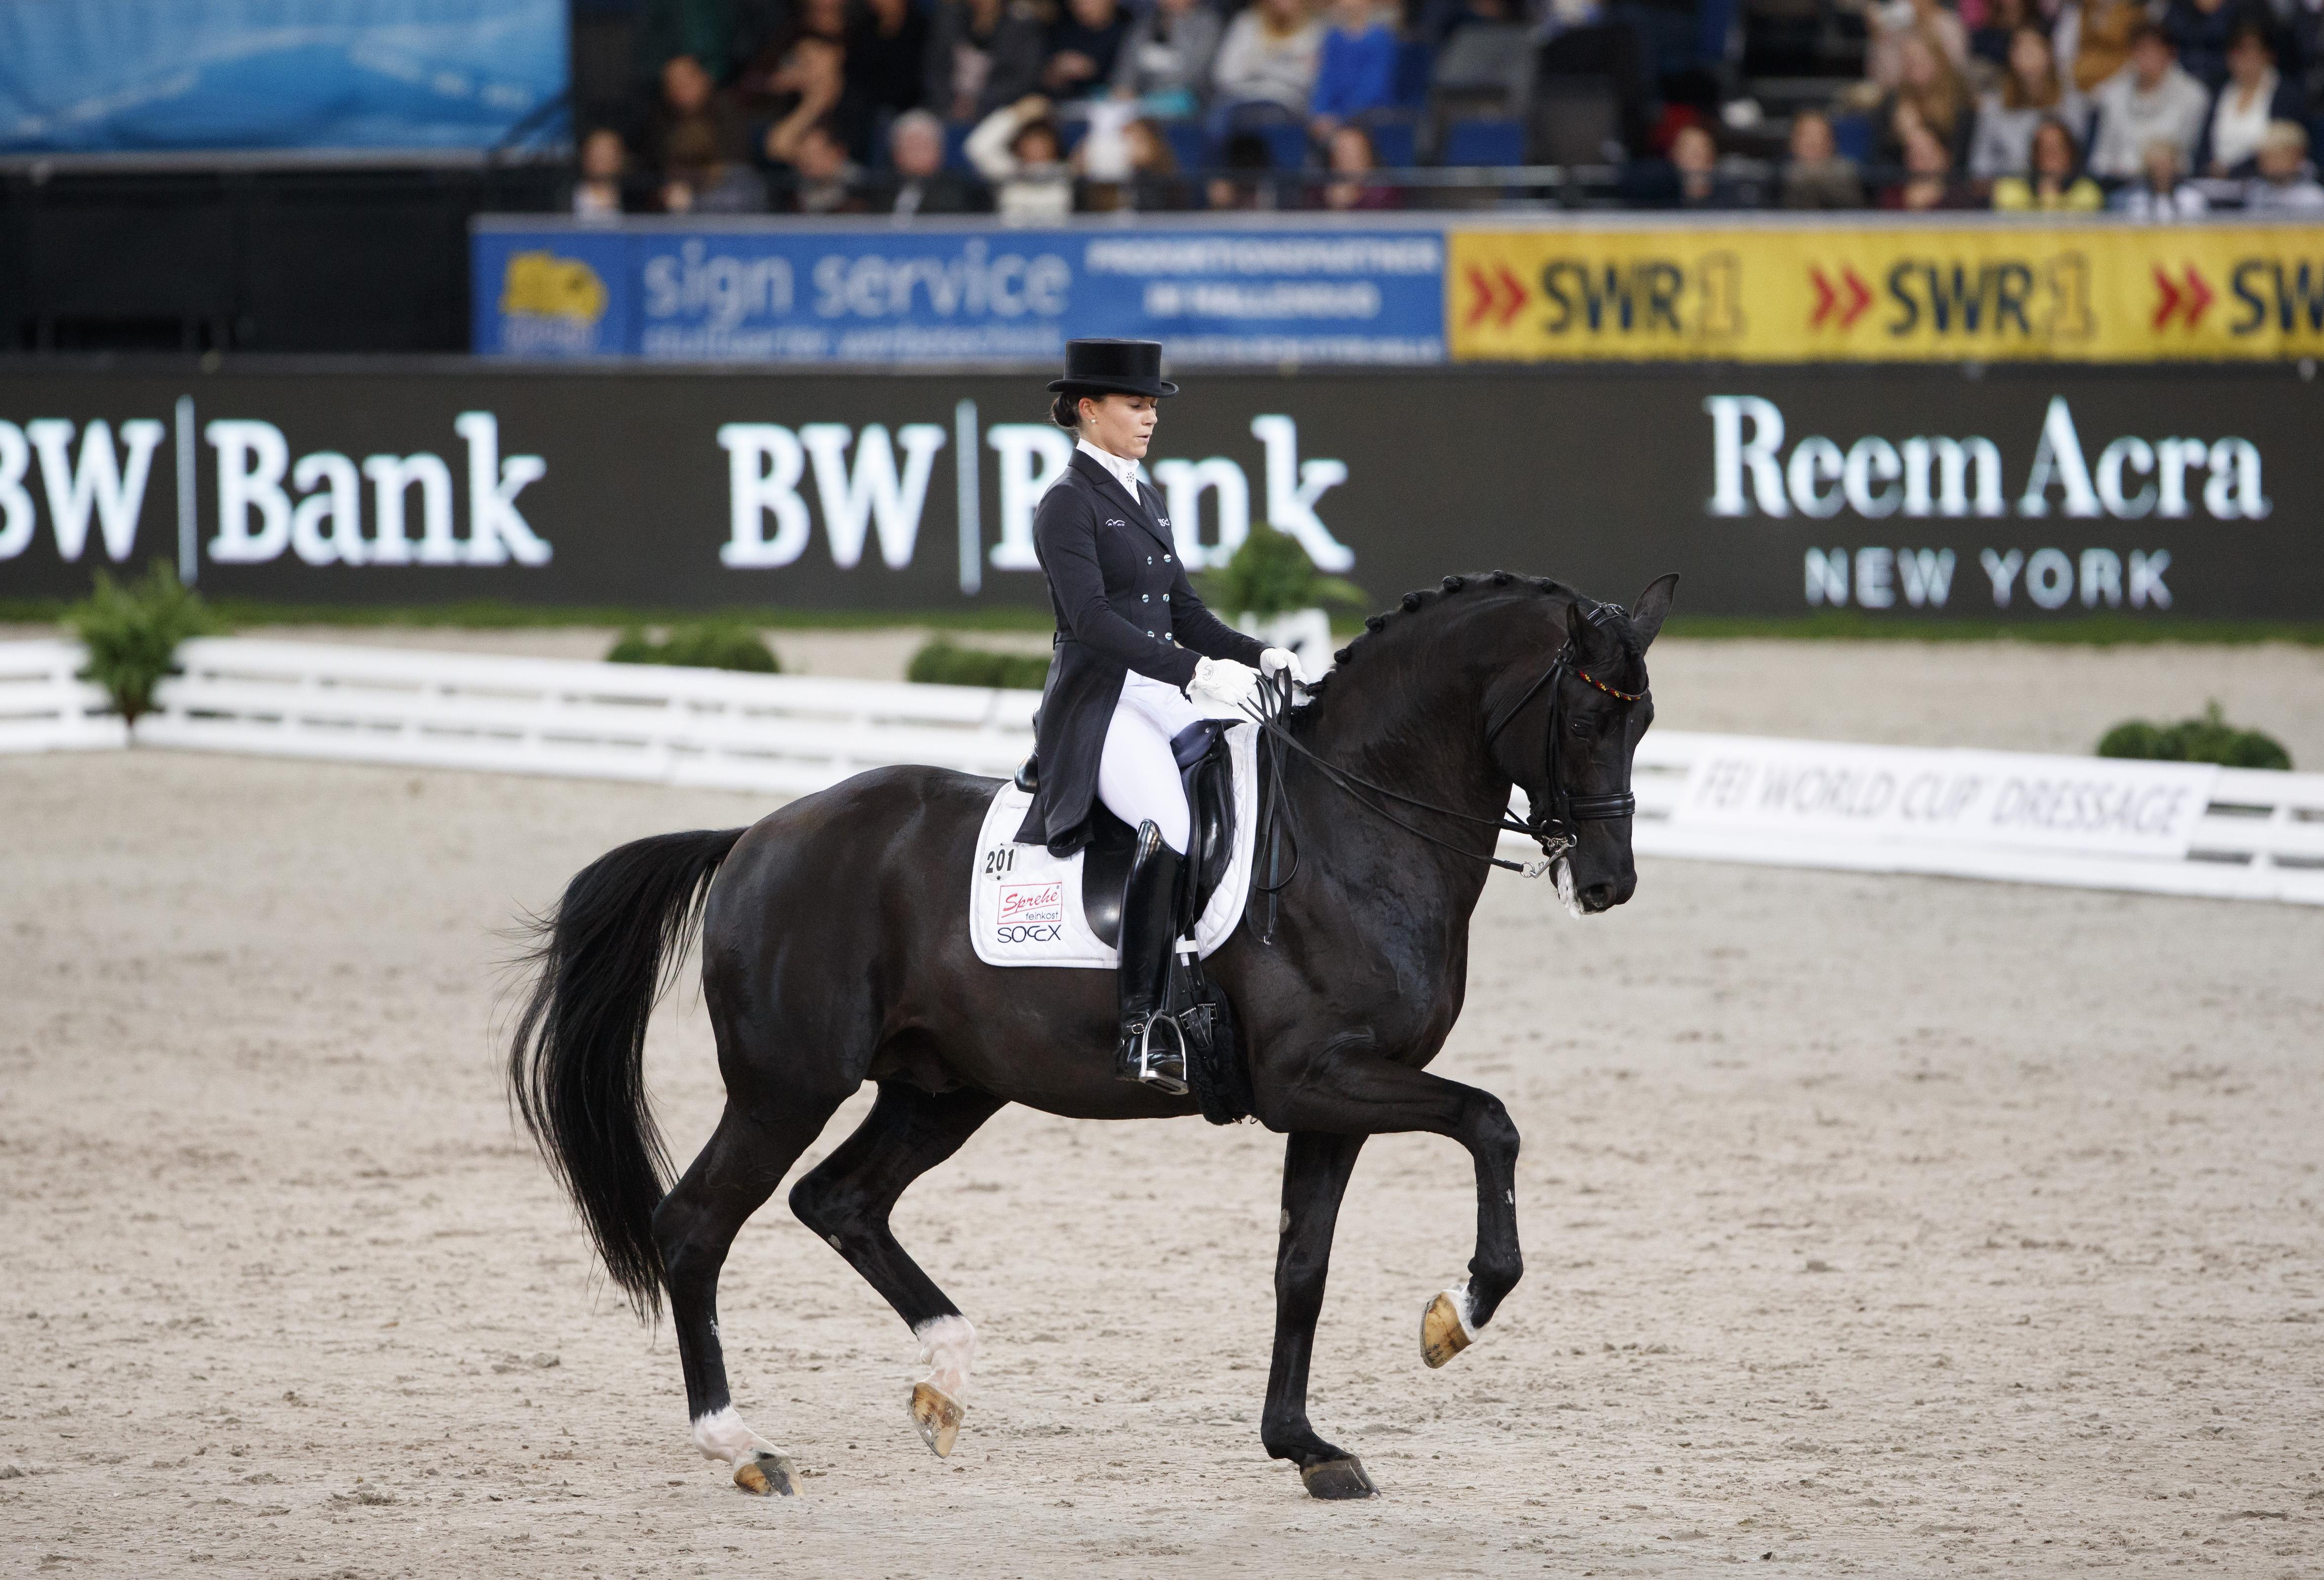 Stuttgart - German Masters 2016 - Kristina Sprehe (GER) & Desperados. Fot. Stefan Lafrentz/FEI.